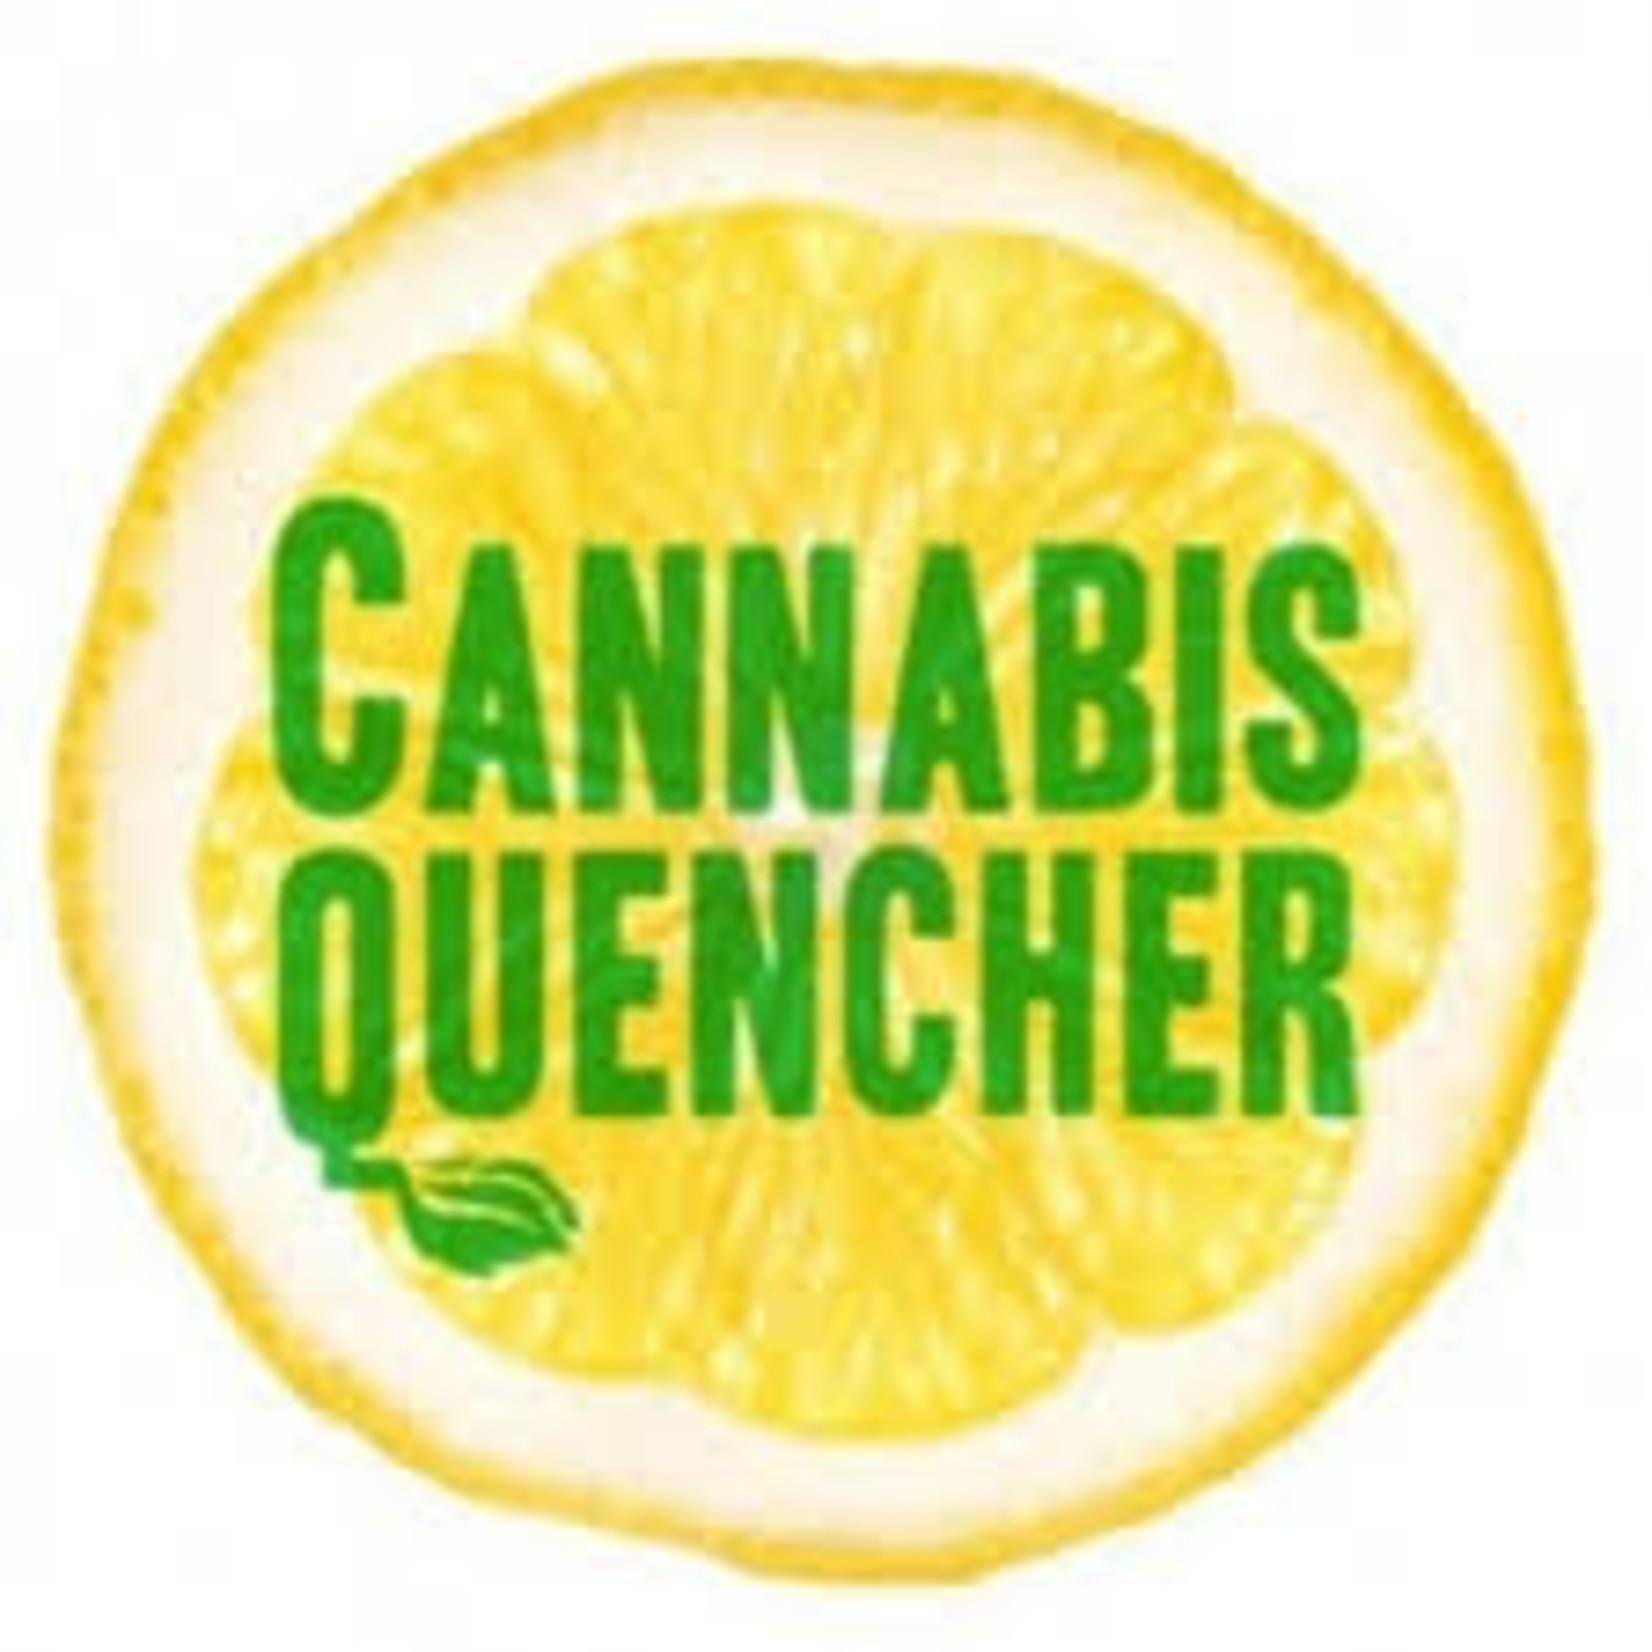 Cannabis Quencher / Watermelon (Hard Candy)